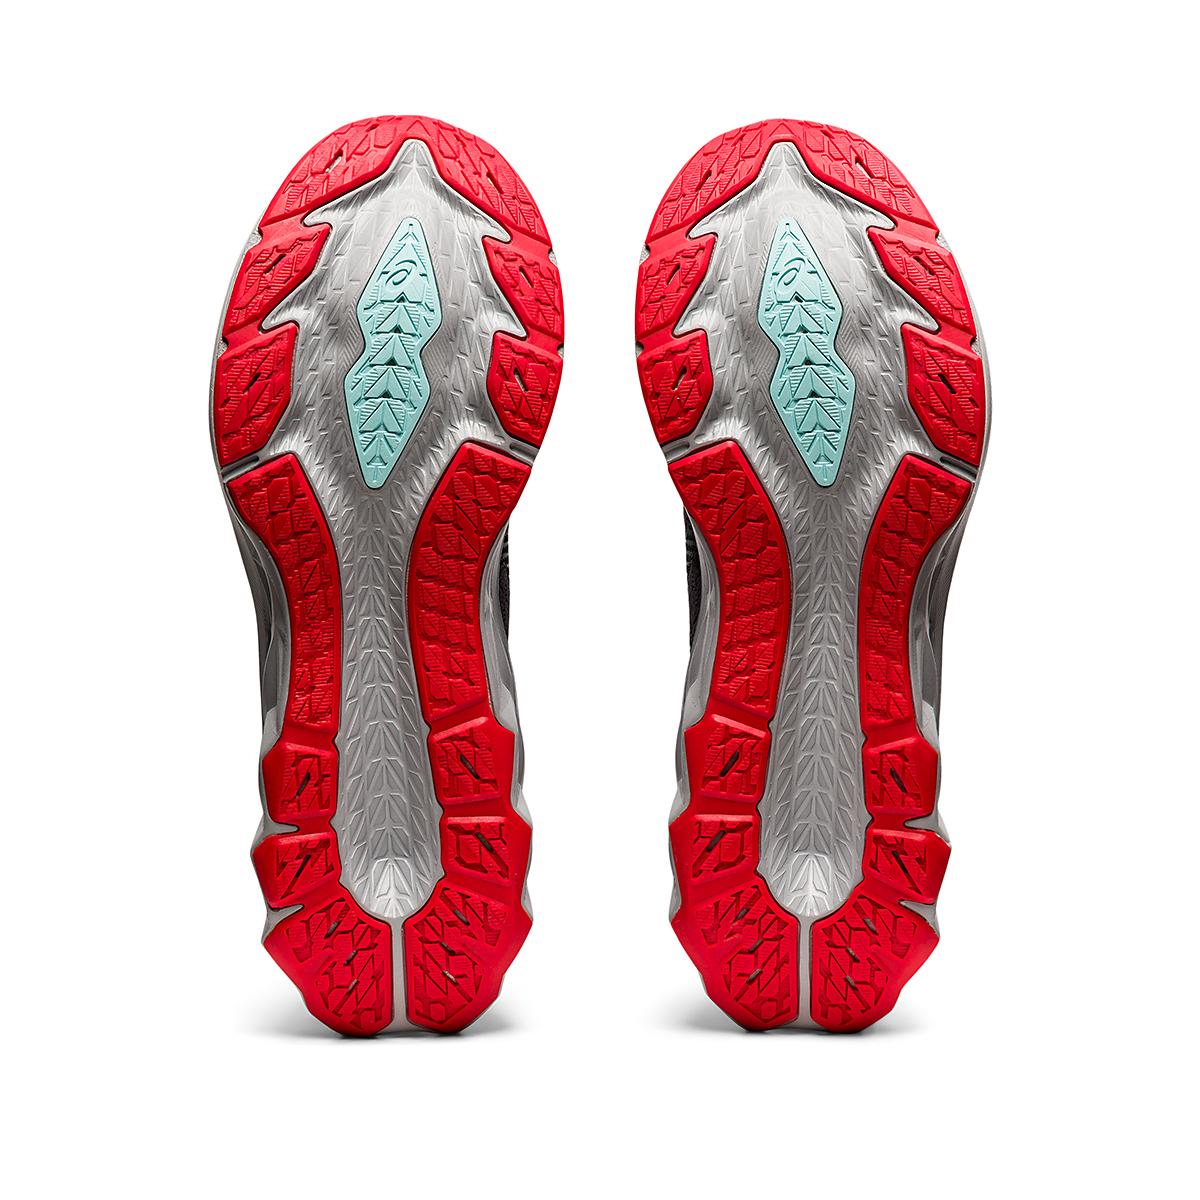 Men's Asics Novablast 2 Running Shoe - Color: Metropolis/Clear Blue - Size: 6 - Width: Regular, Metropolis/Clear Blue, large, image 7